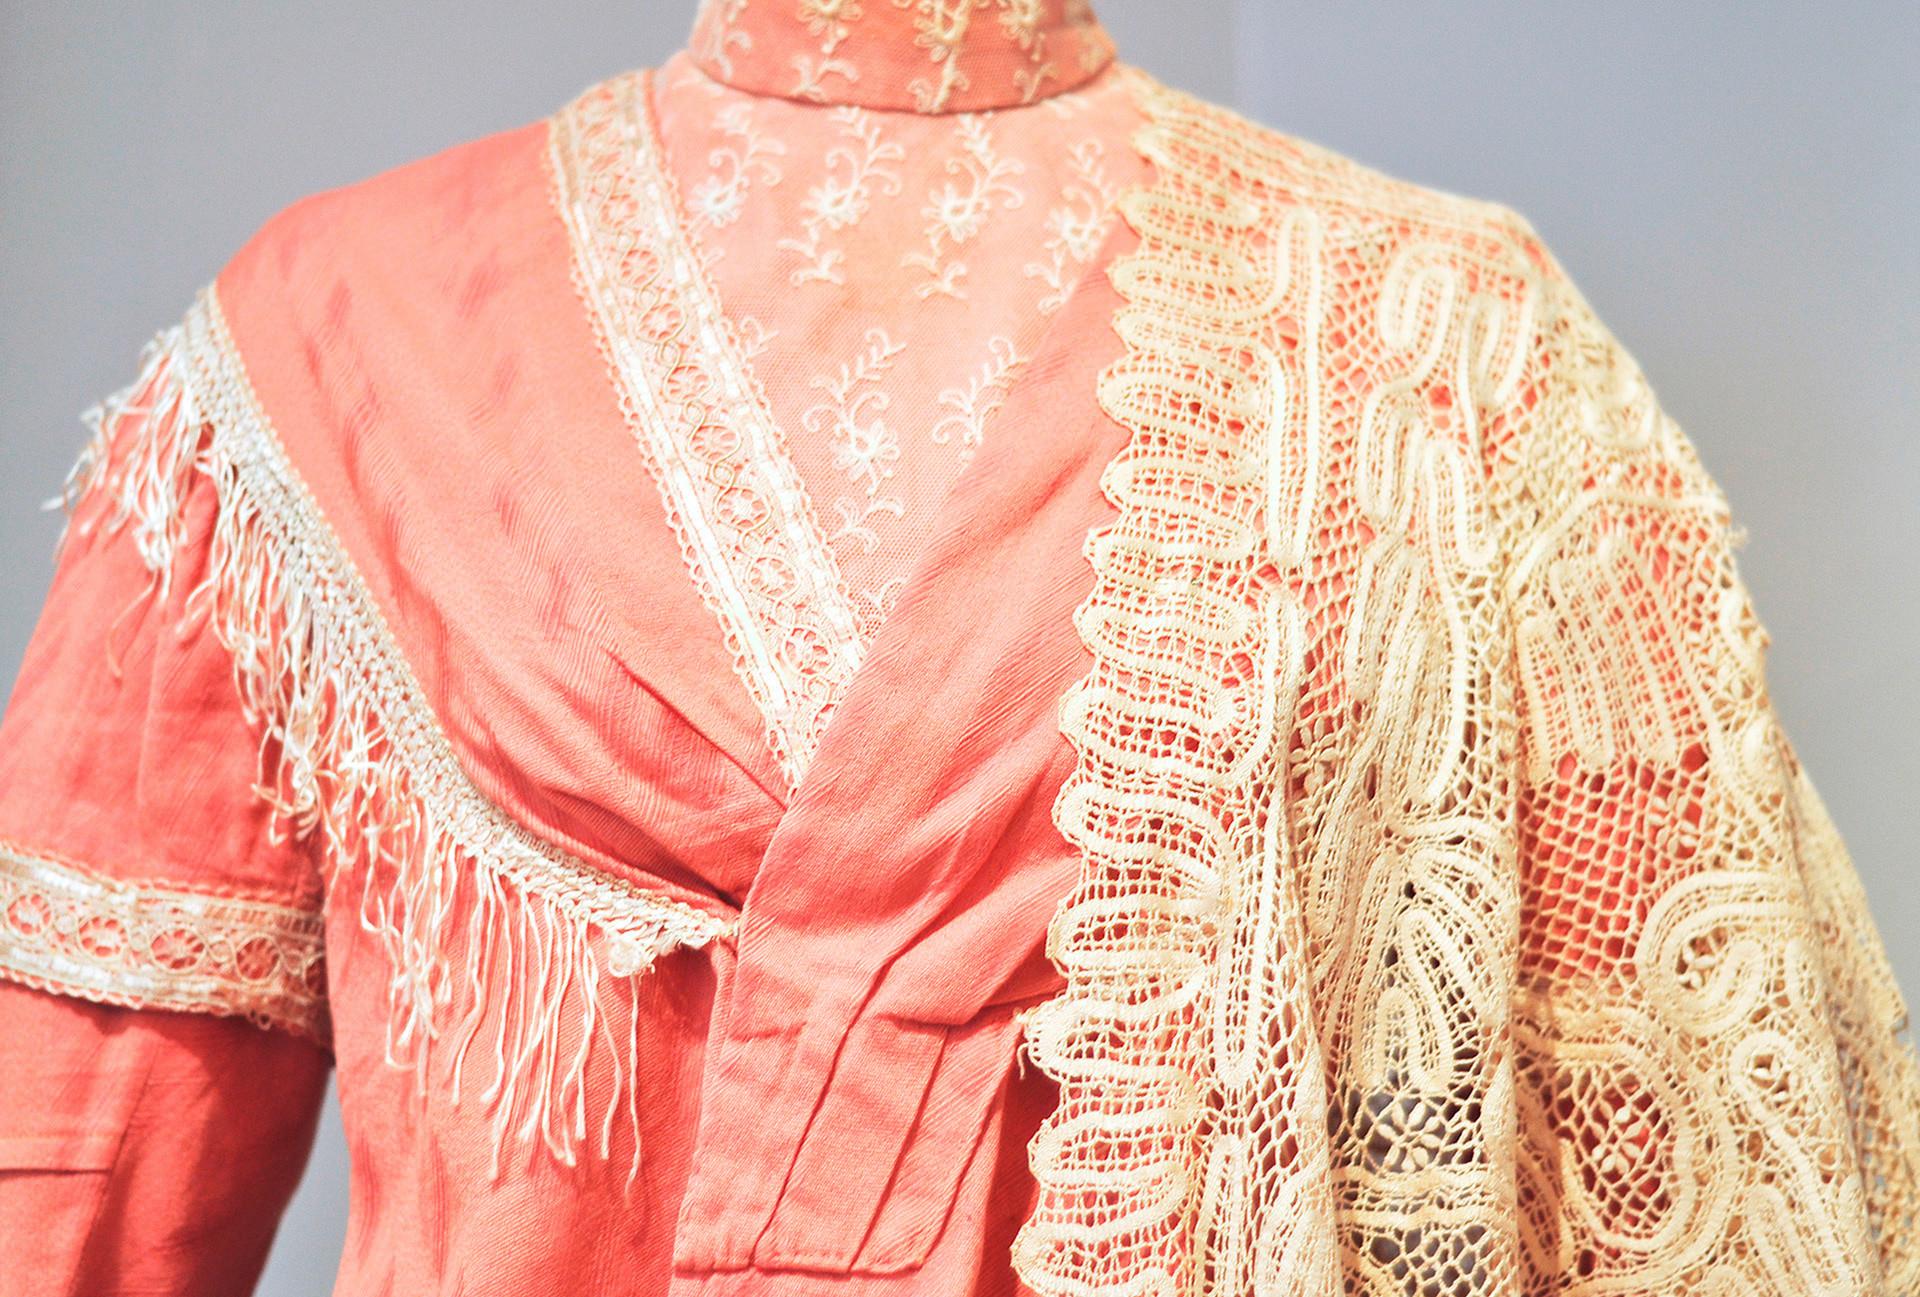 Gaun model lama dengan selendang berenda, Museum Renda.